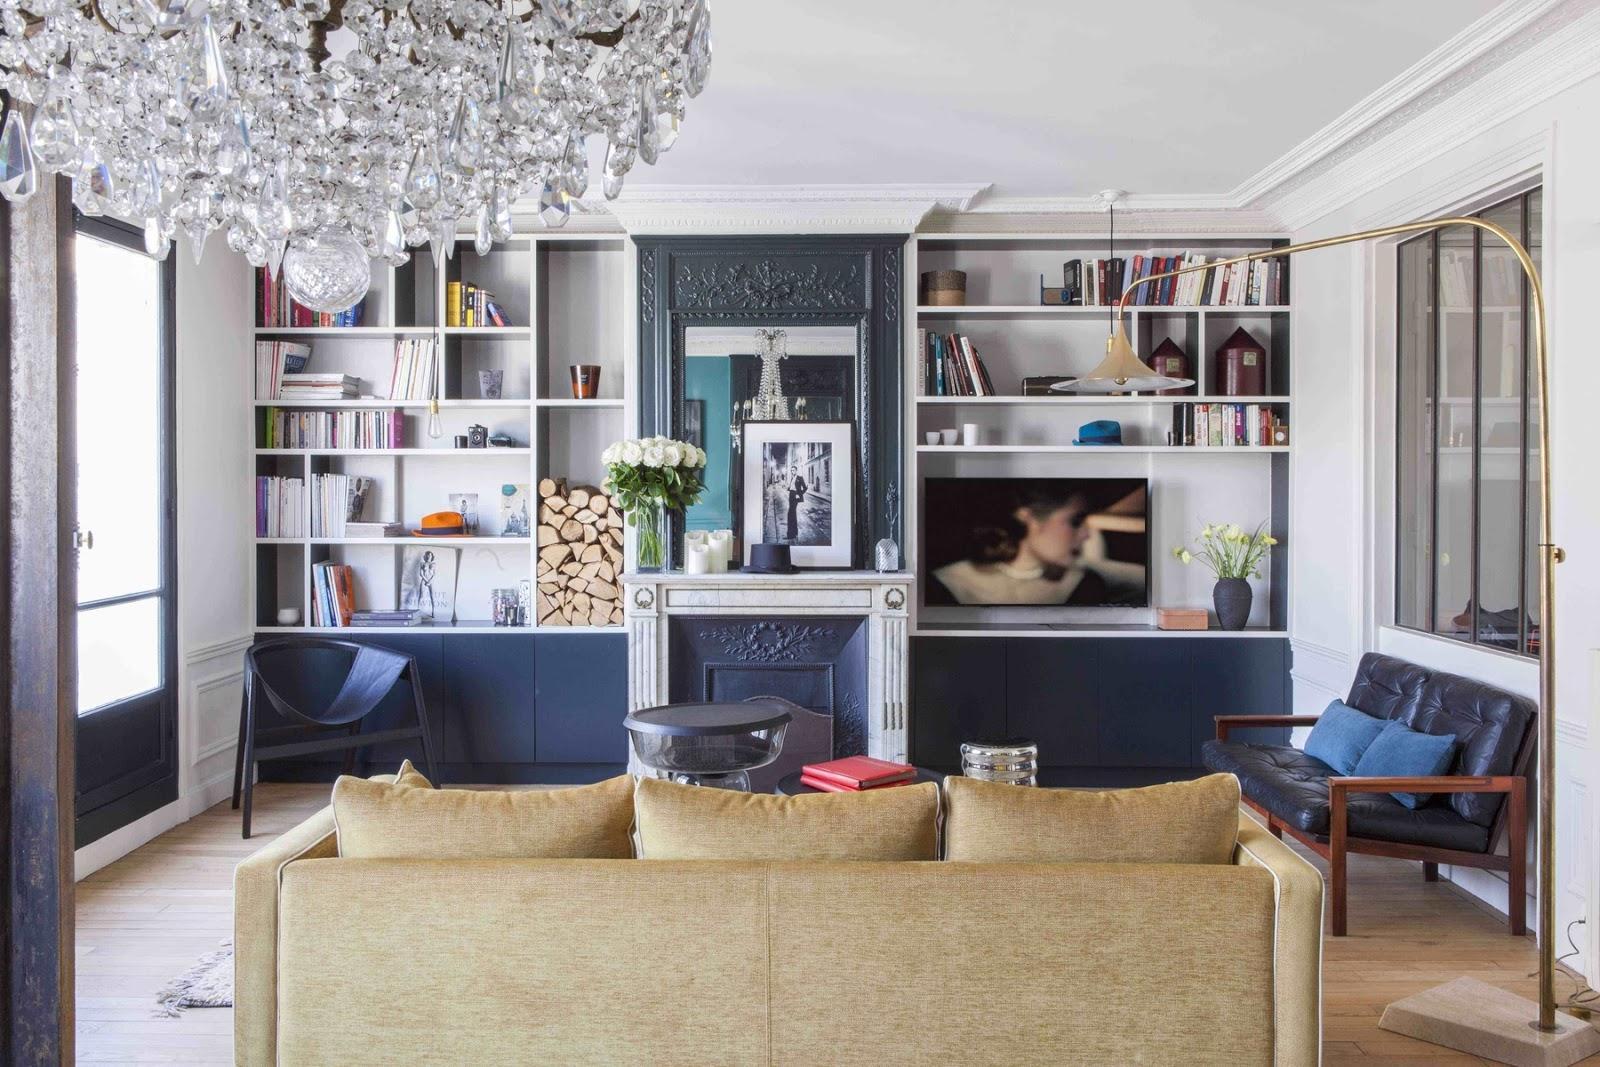 paris apartment with teal color, mid century modern furniture, crystal pendant, bookshelf